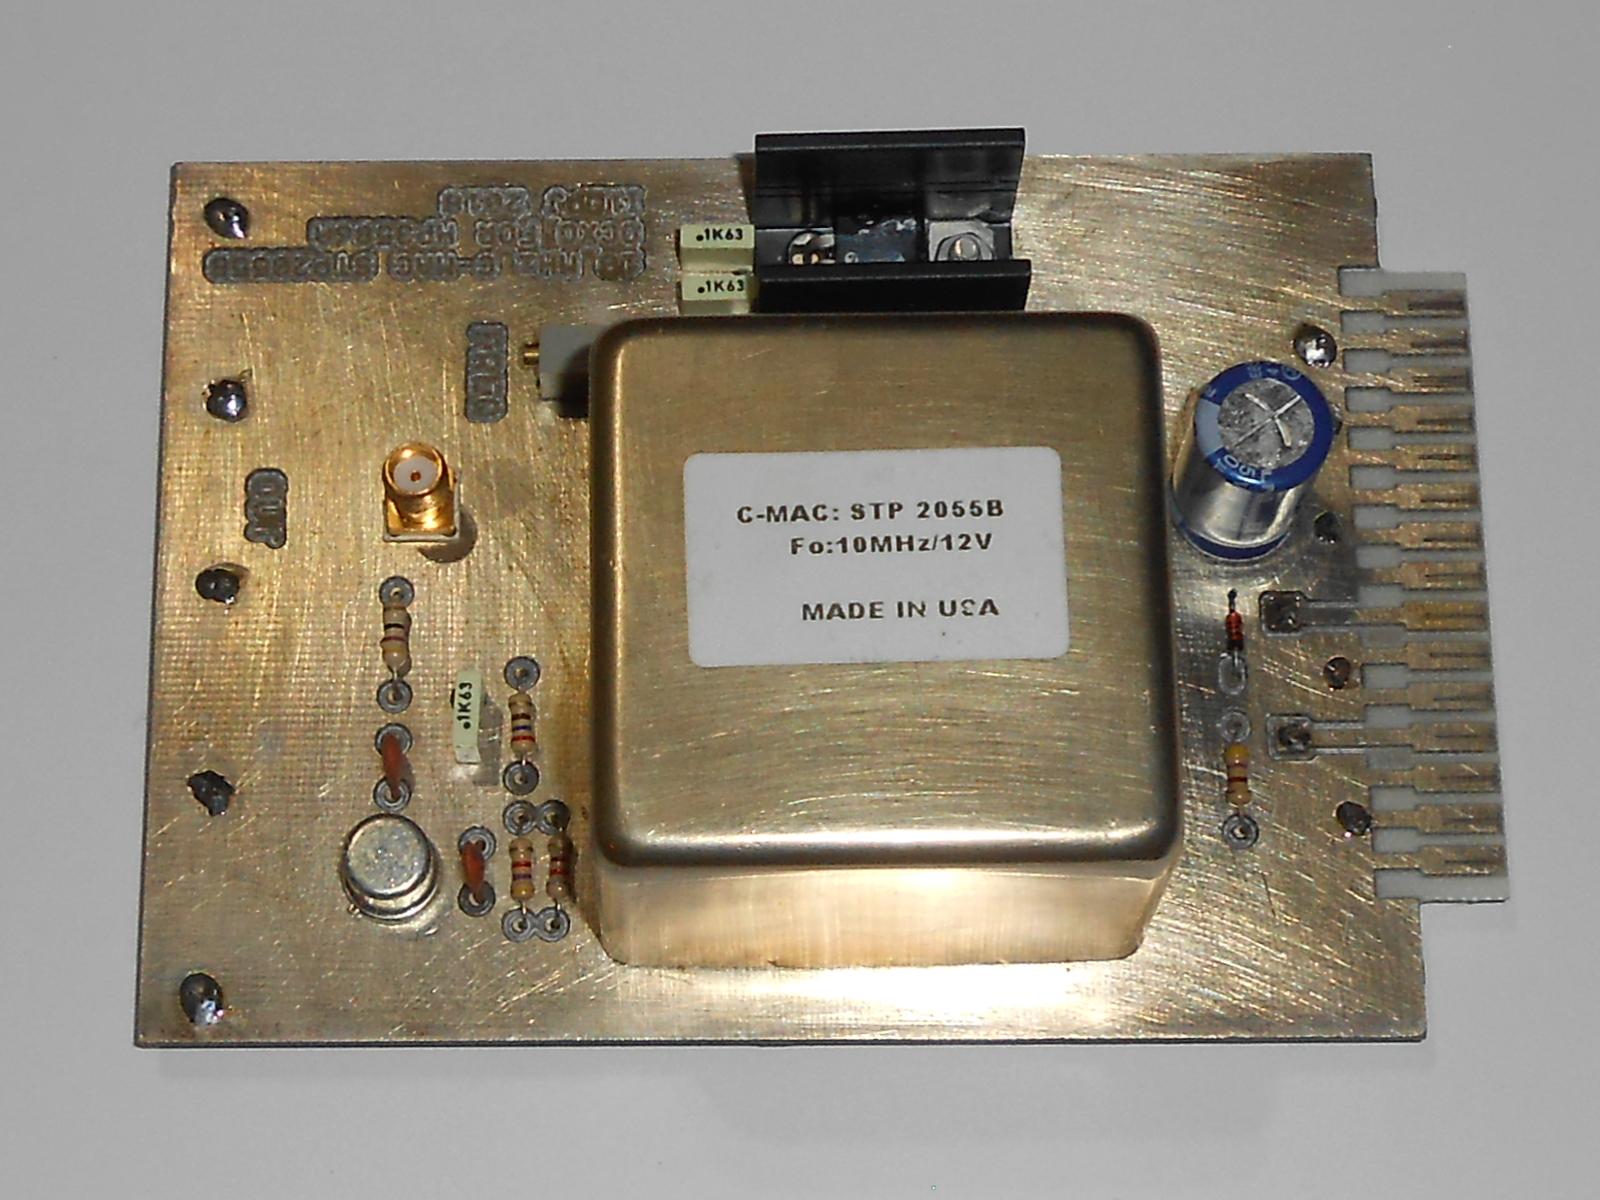 Schema Elettrico Voltmetro Per Auto : Hardware vario